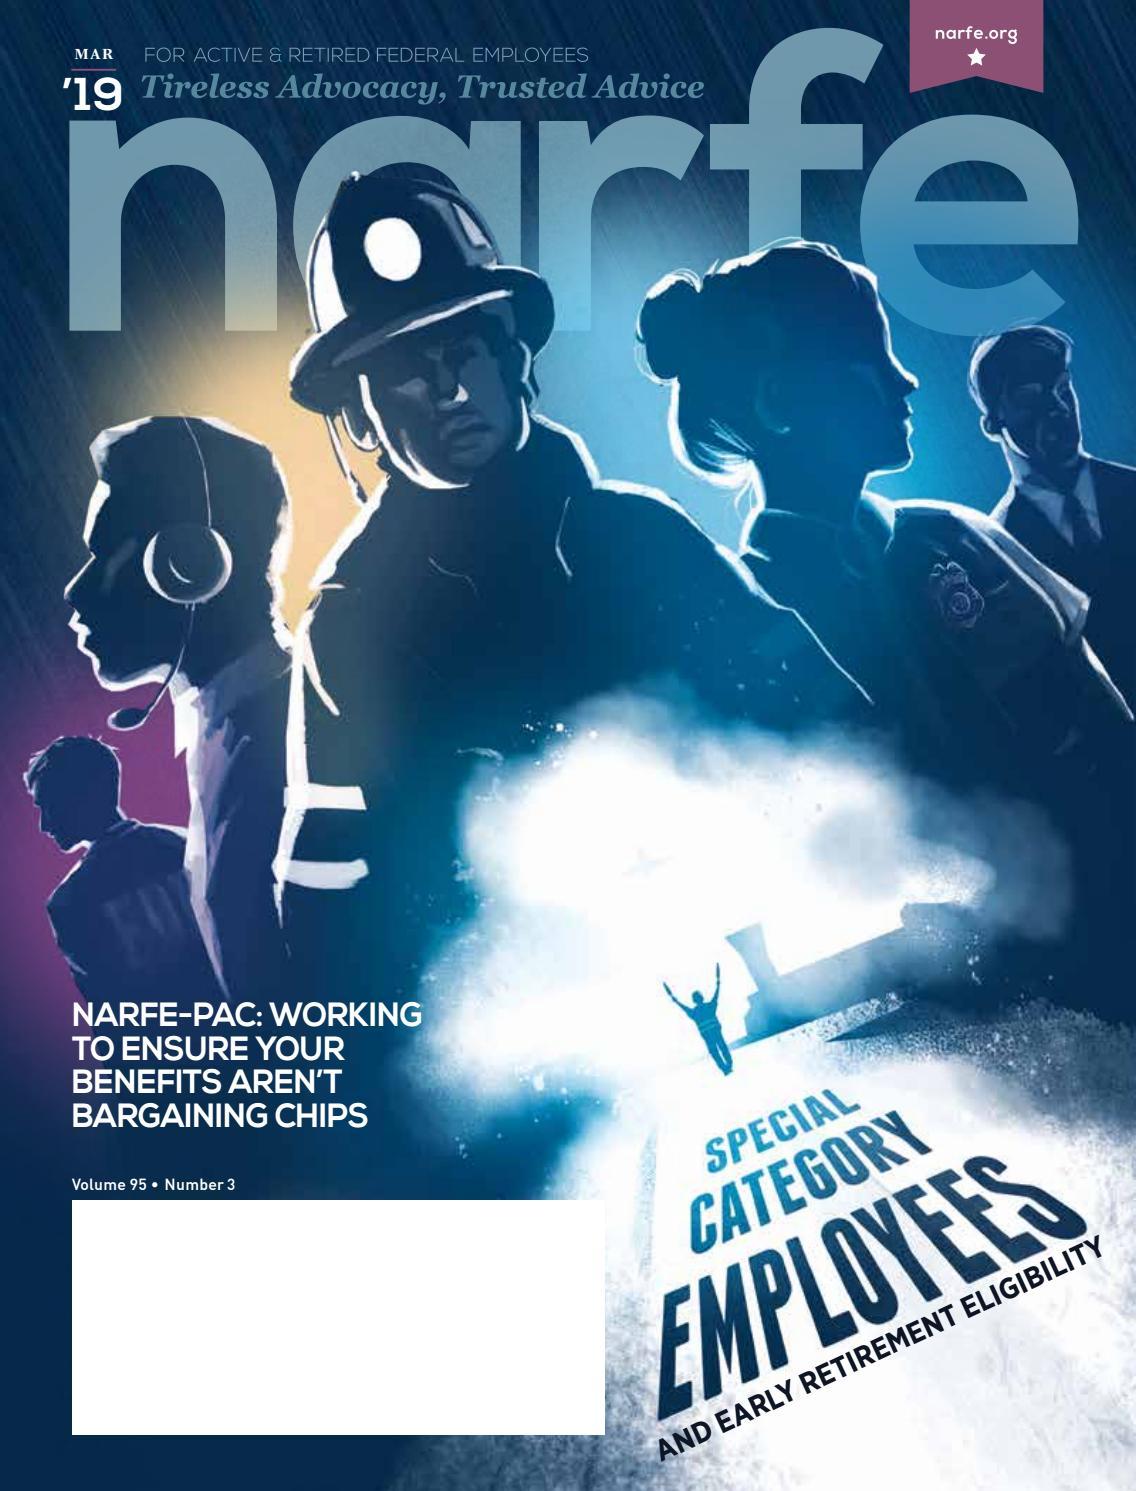 37e46f30a00b MARCH 2019 NARFE Magazine by NARFE - issuu